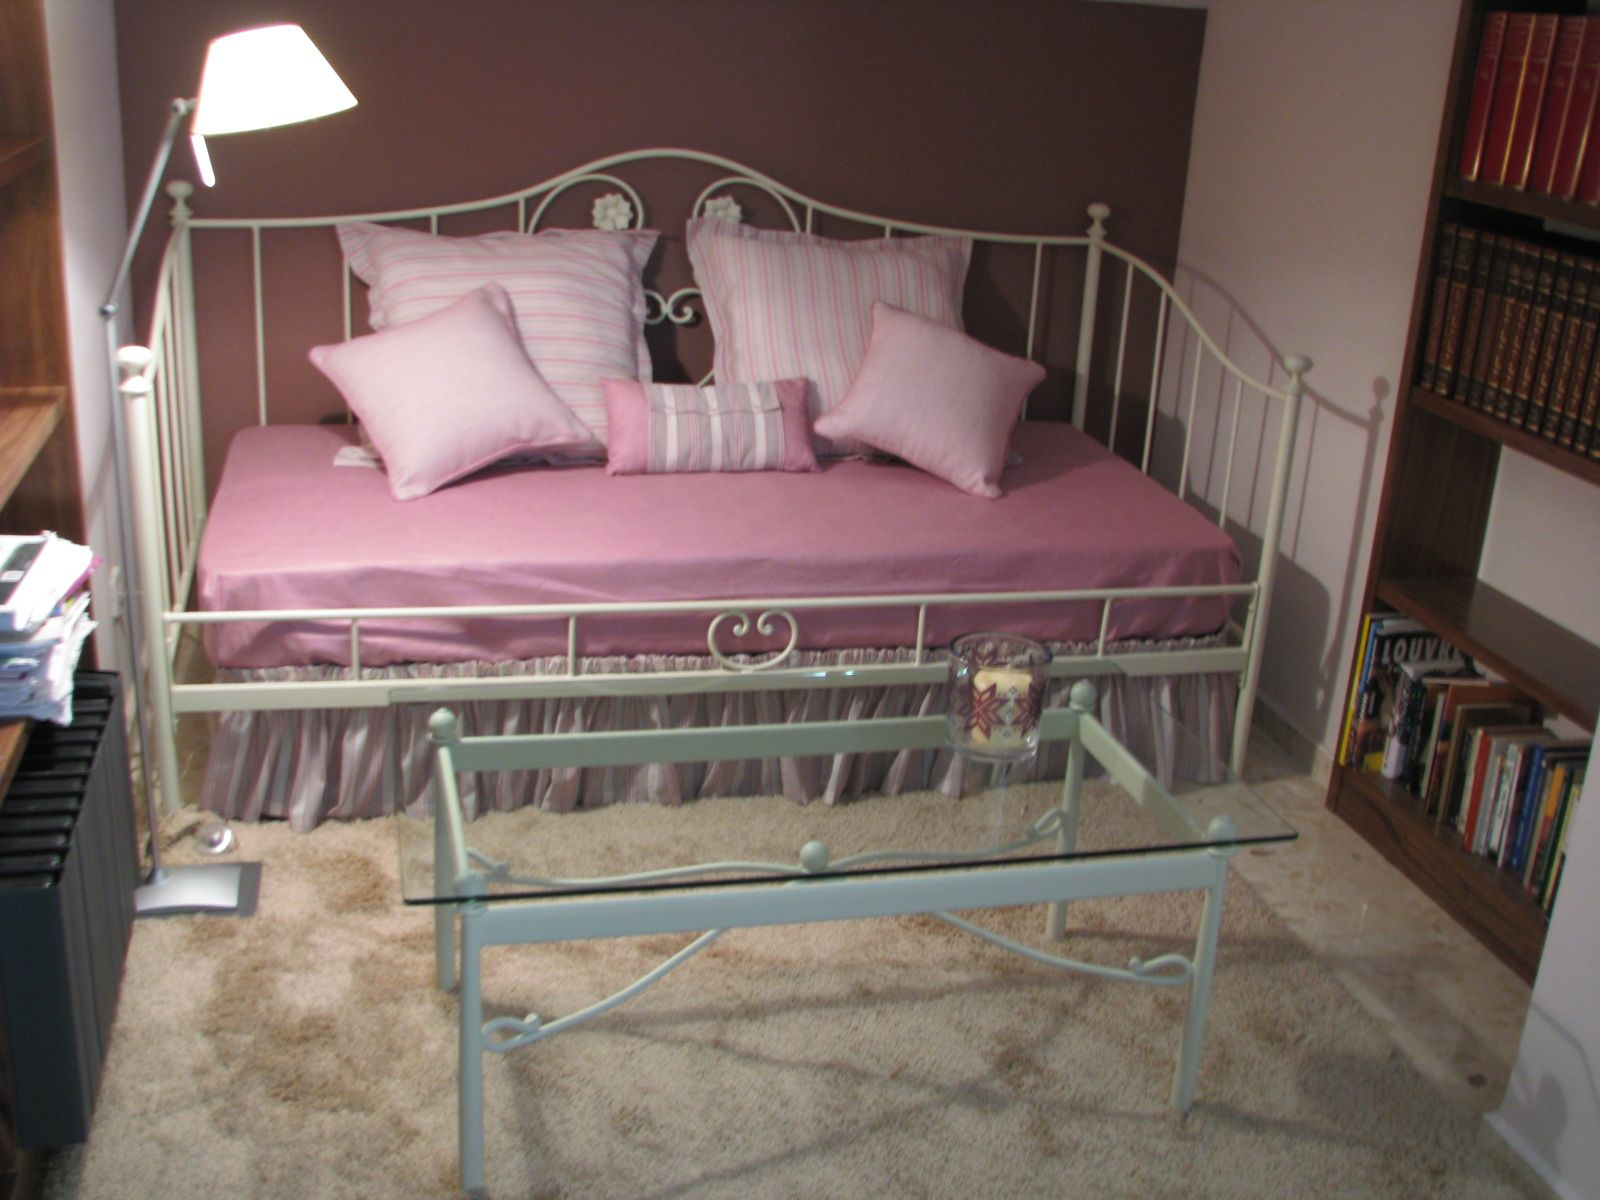 Cama Sofa Forja Hideaway Bed Mattress Divan De Modelo Lino Tienda Online Www